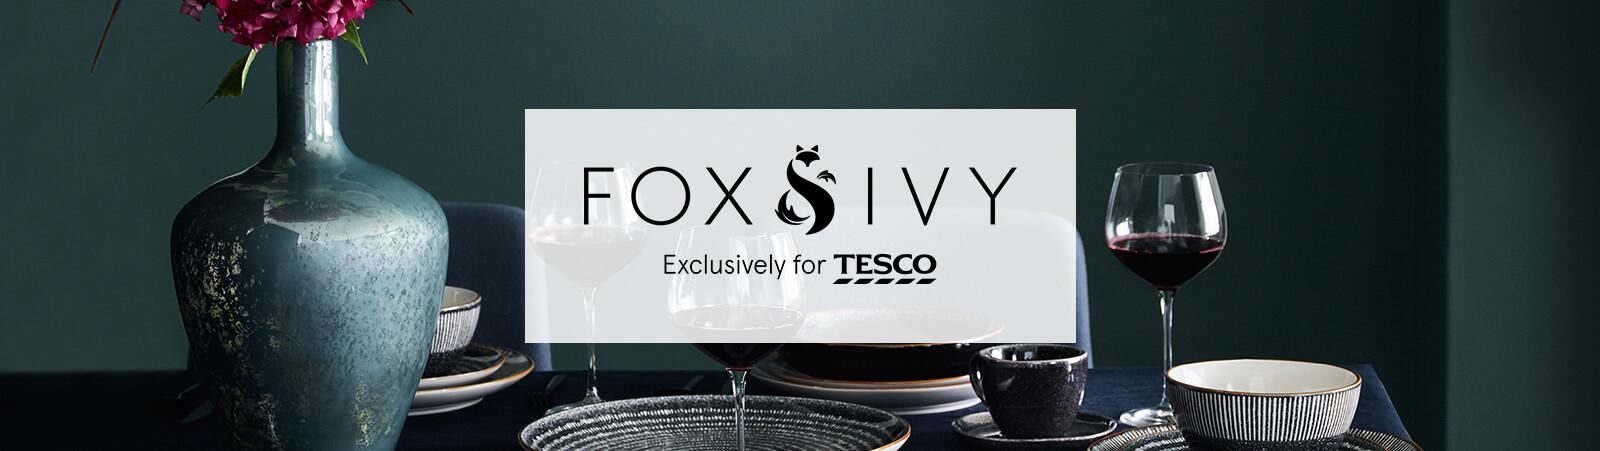 Fox & Ivy | Bedding, home accessories & tableware - Tesco Groceries